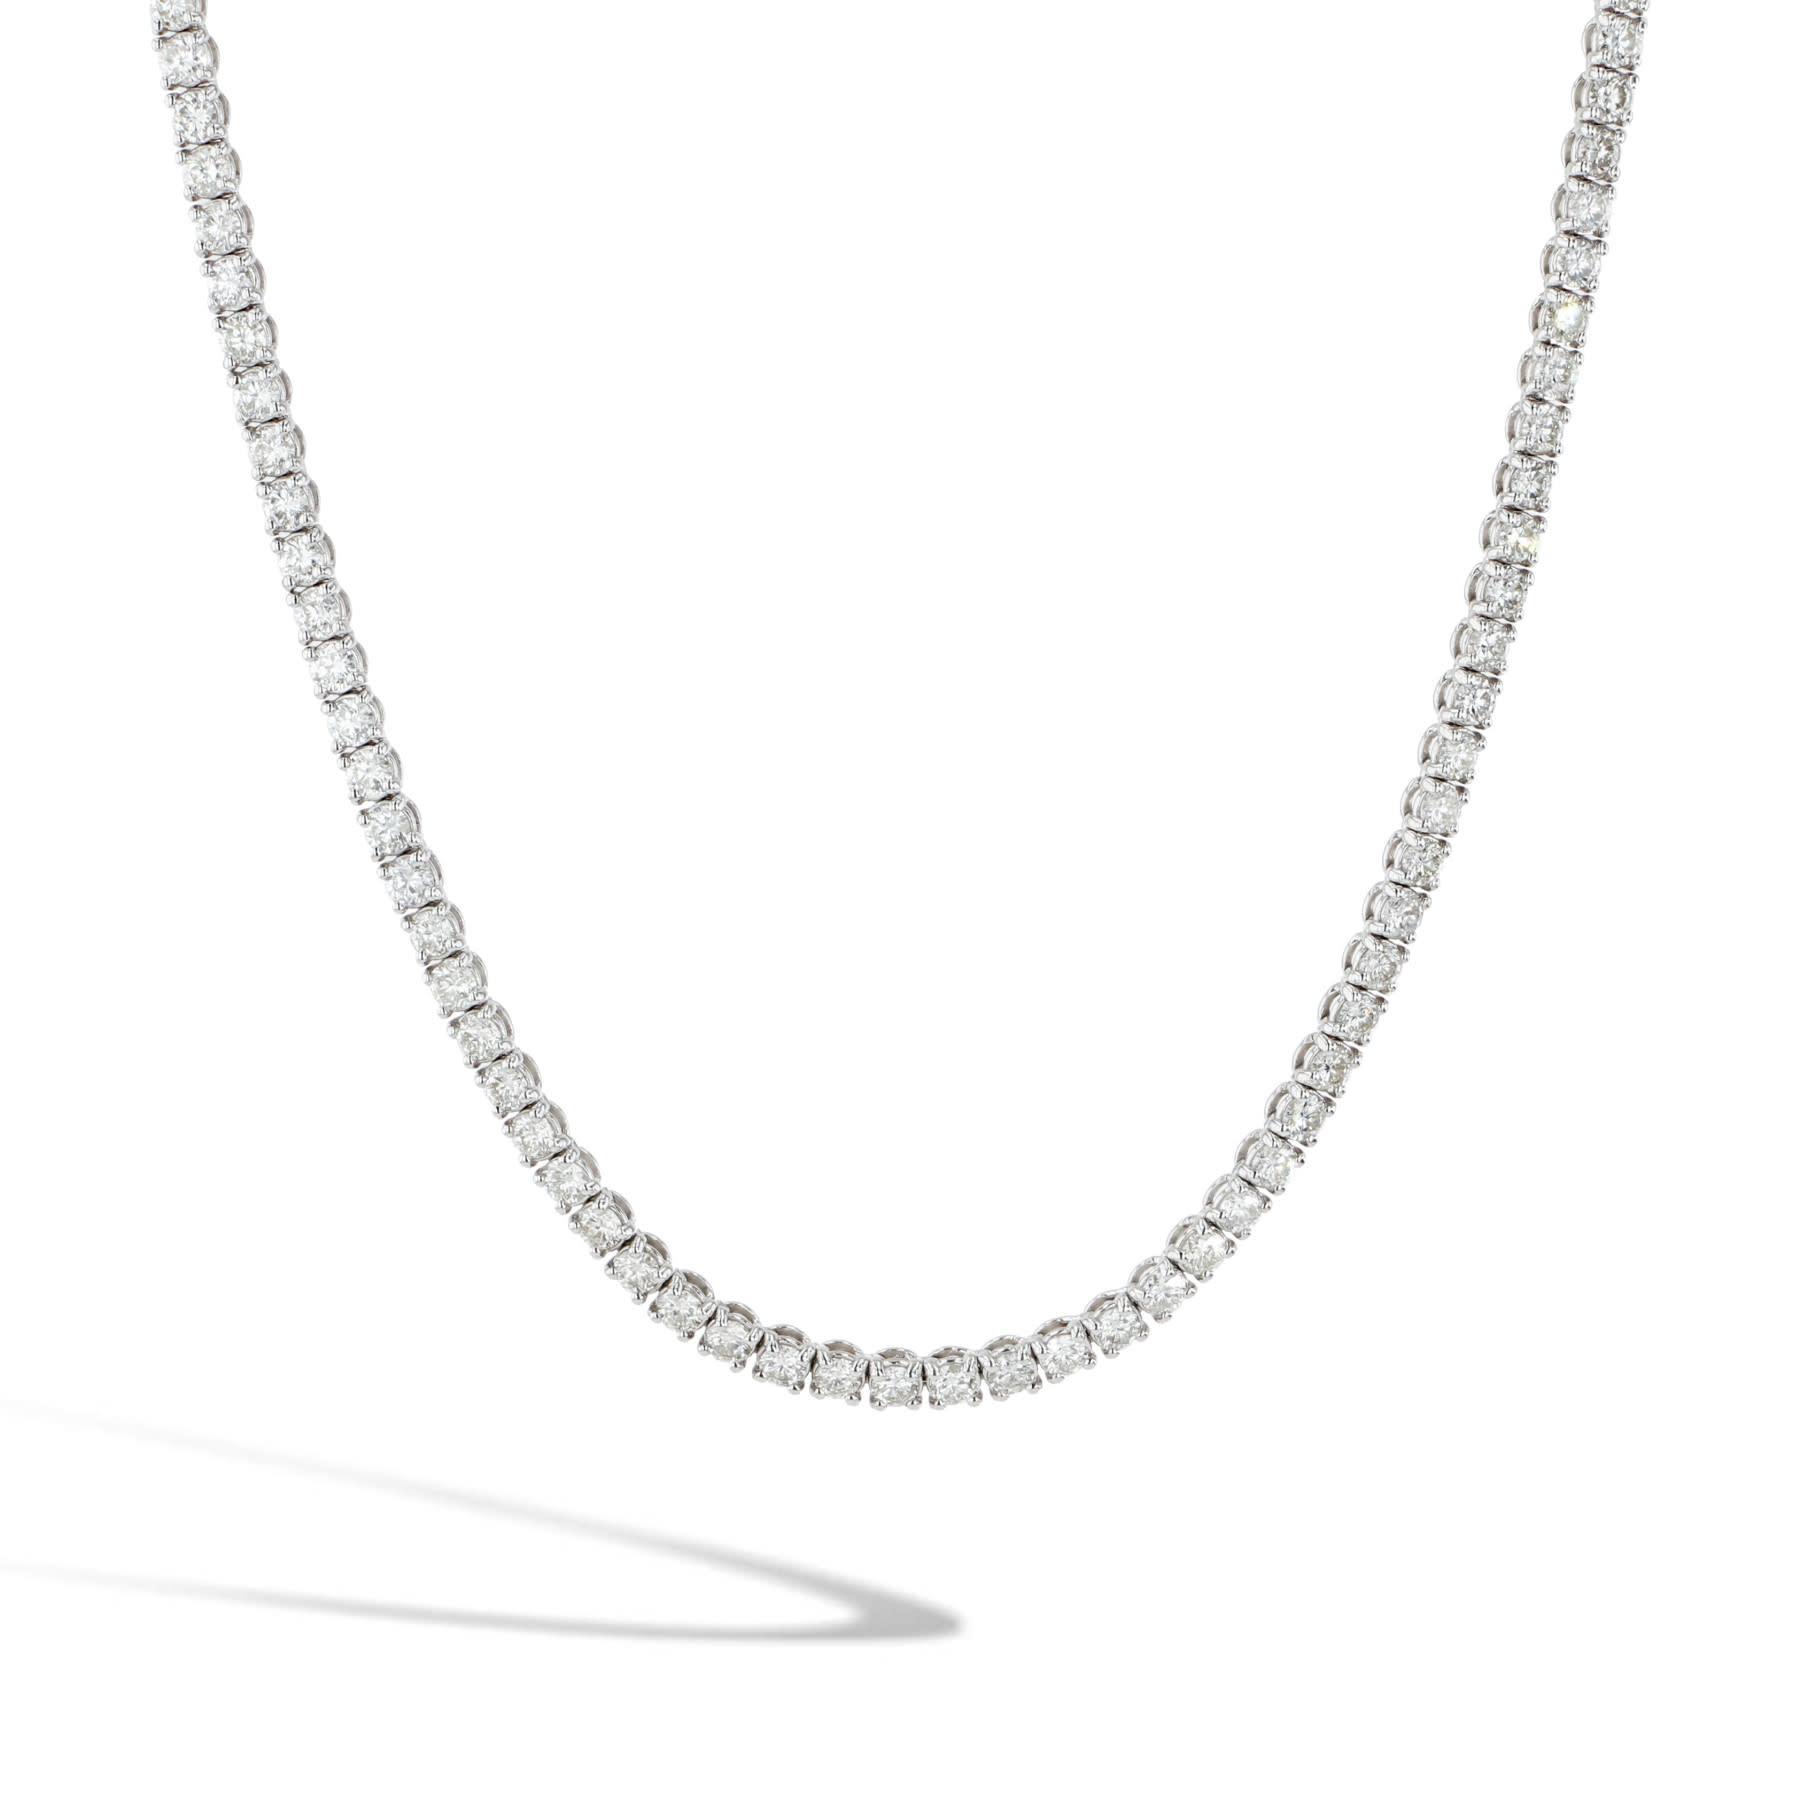 14KW 7CTTW LG Diamond Tennis Necklace